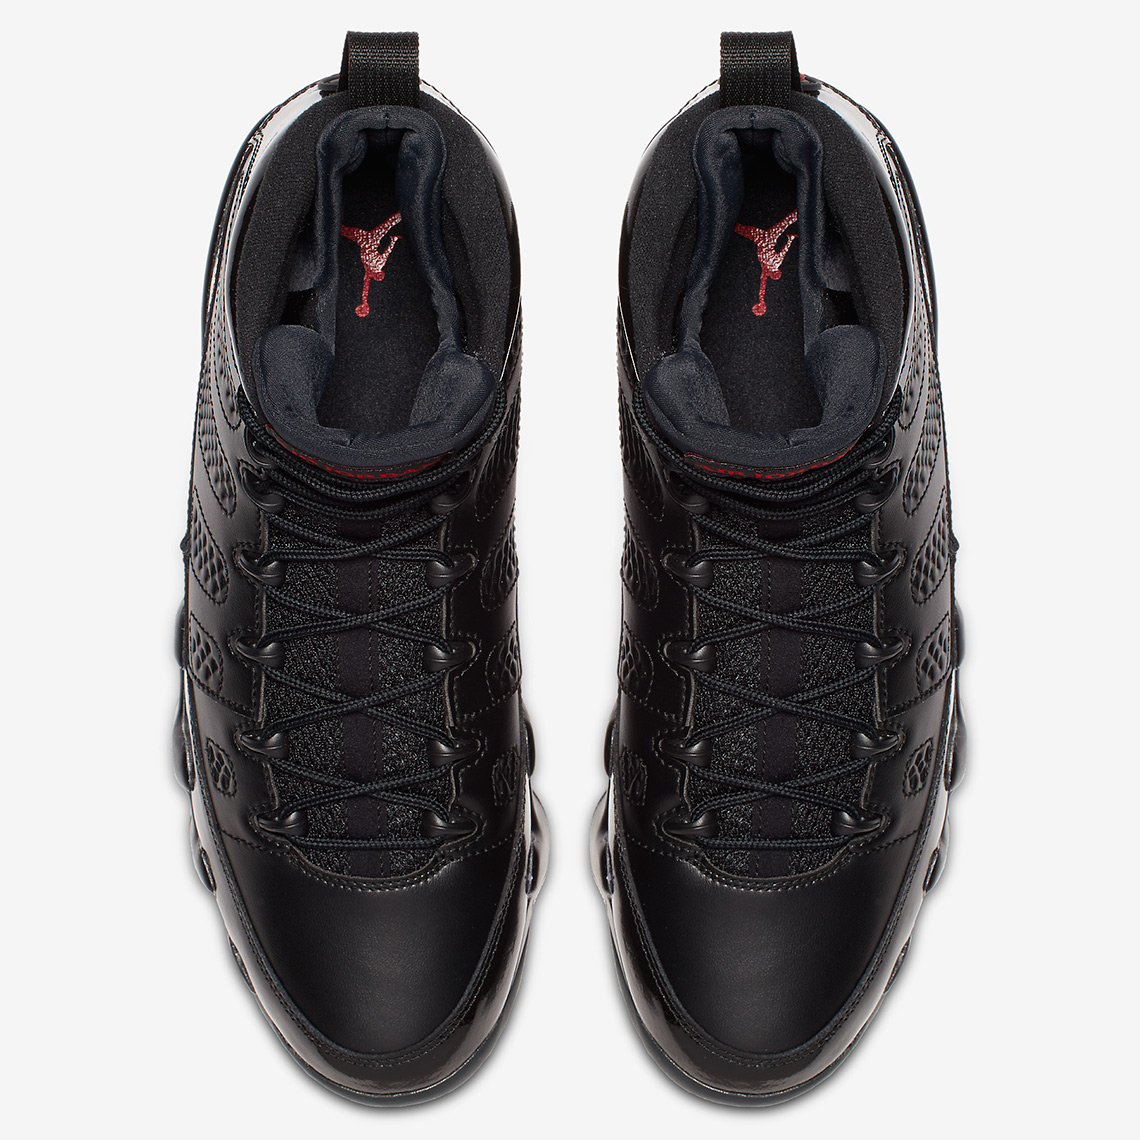 826b1a9c73dbb5 Air Jordan 9